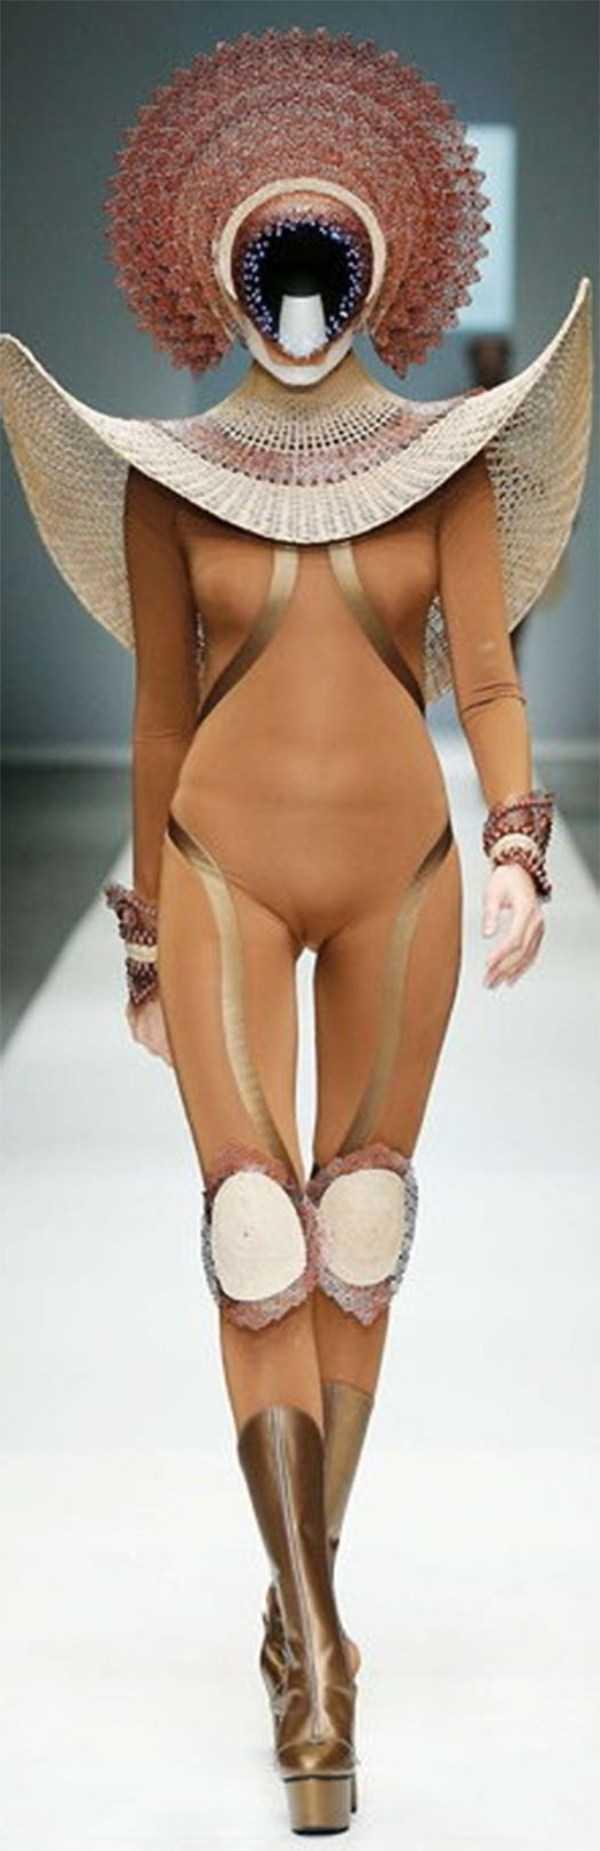 insane-fashion (4)